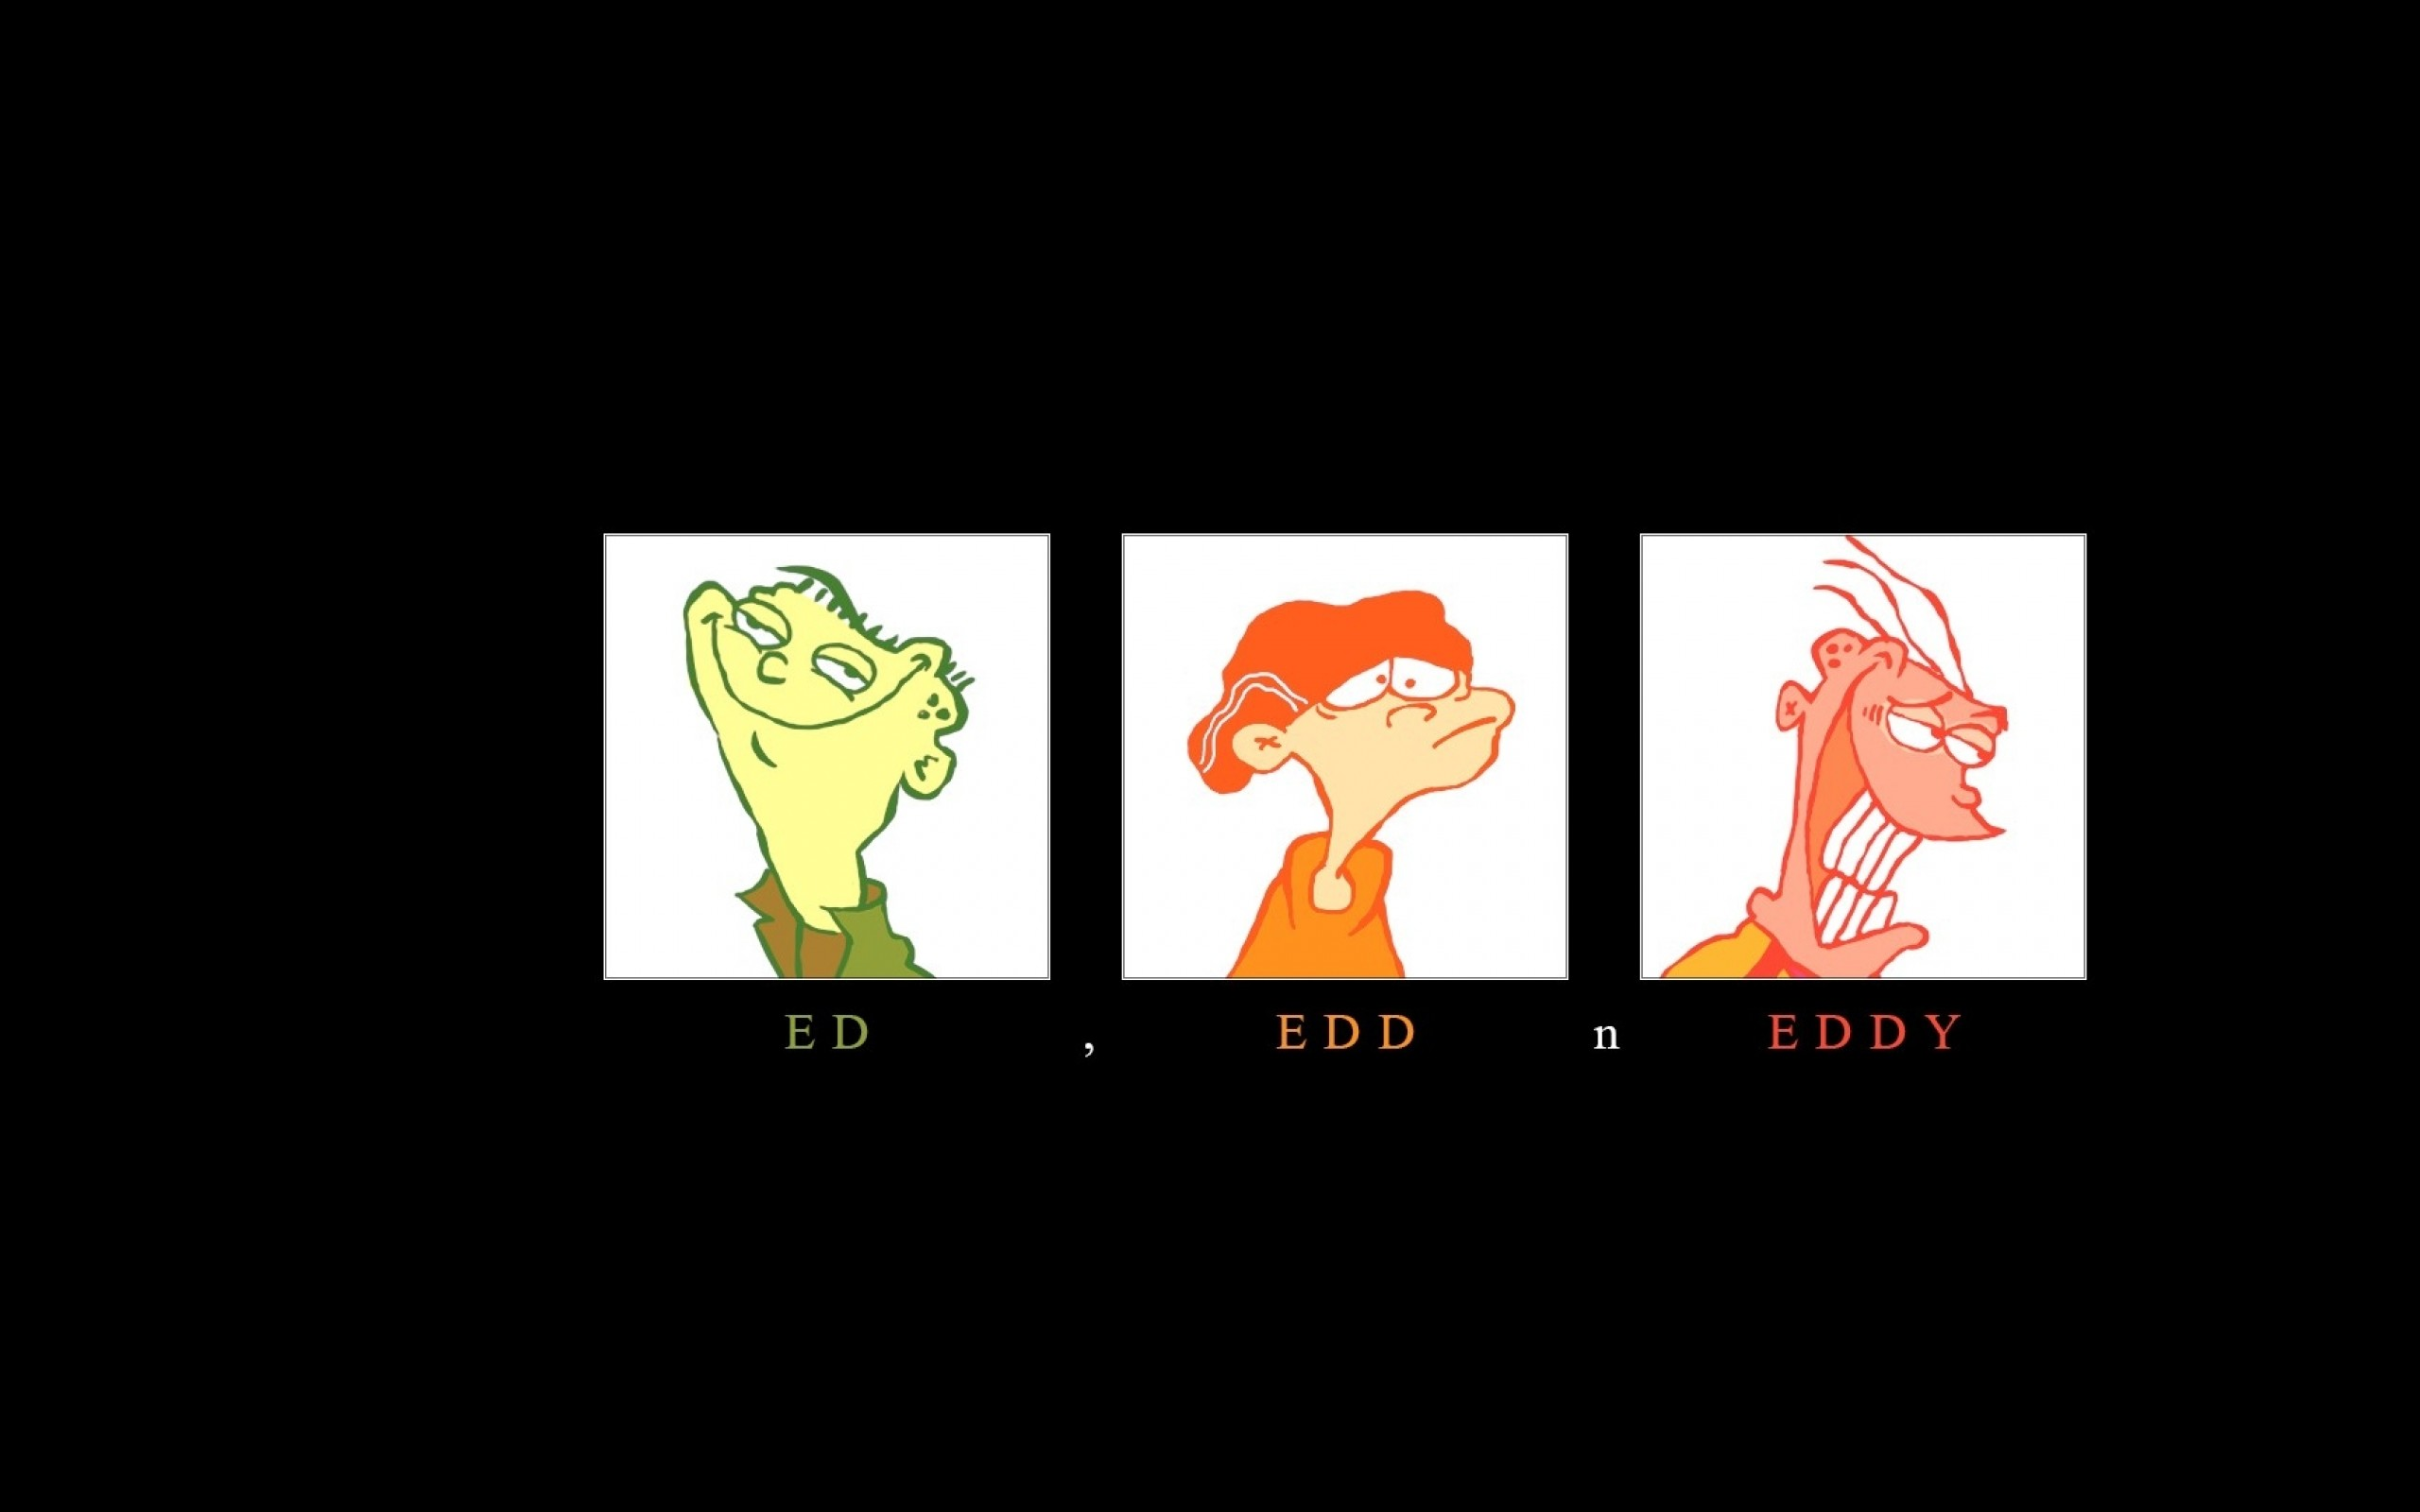 cartoons cartoon network ed ed edd n eddy eddy plain 70s style nineties 80s  Wallpaper HD